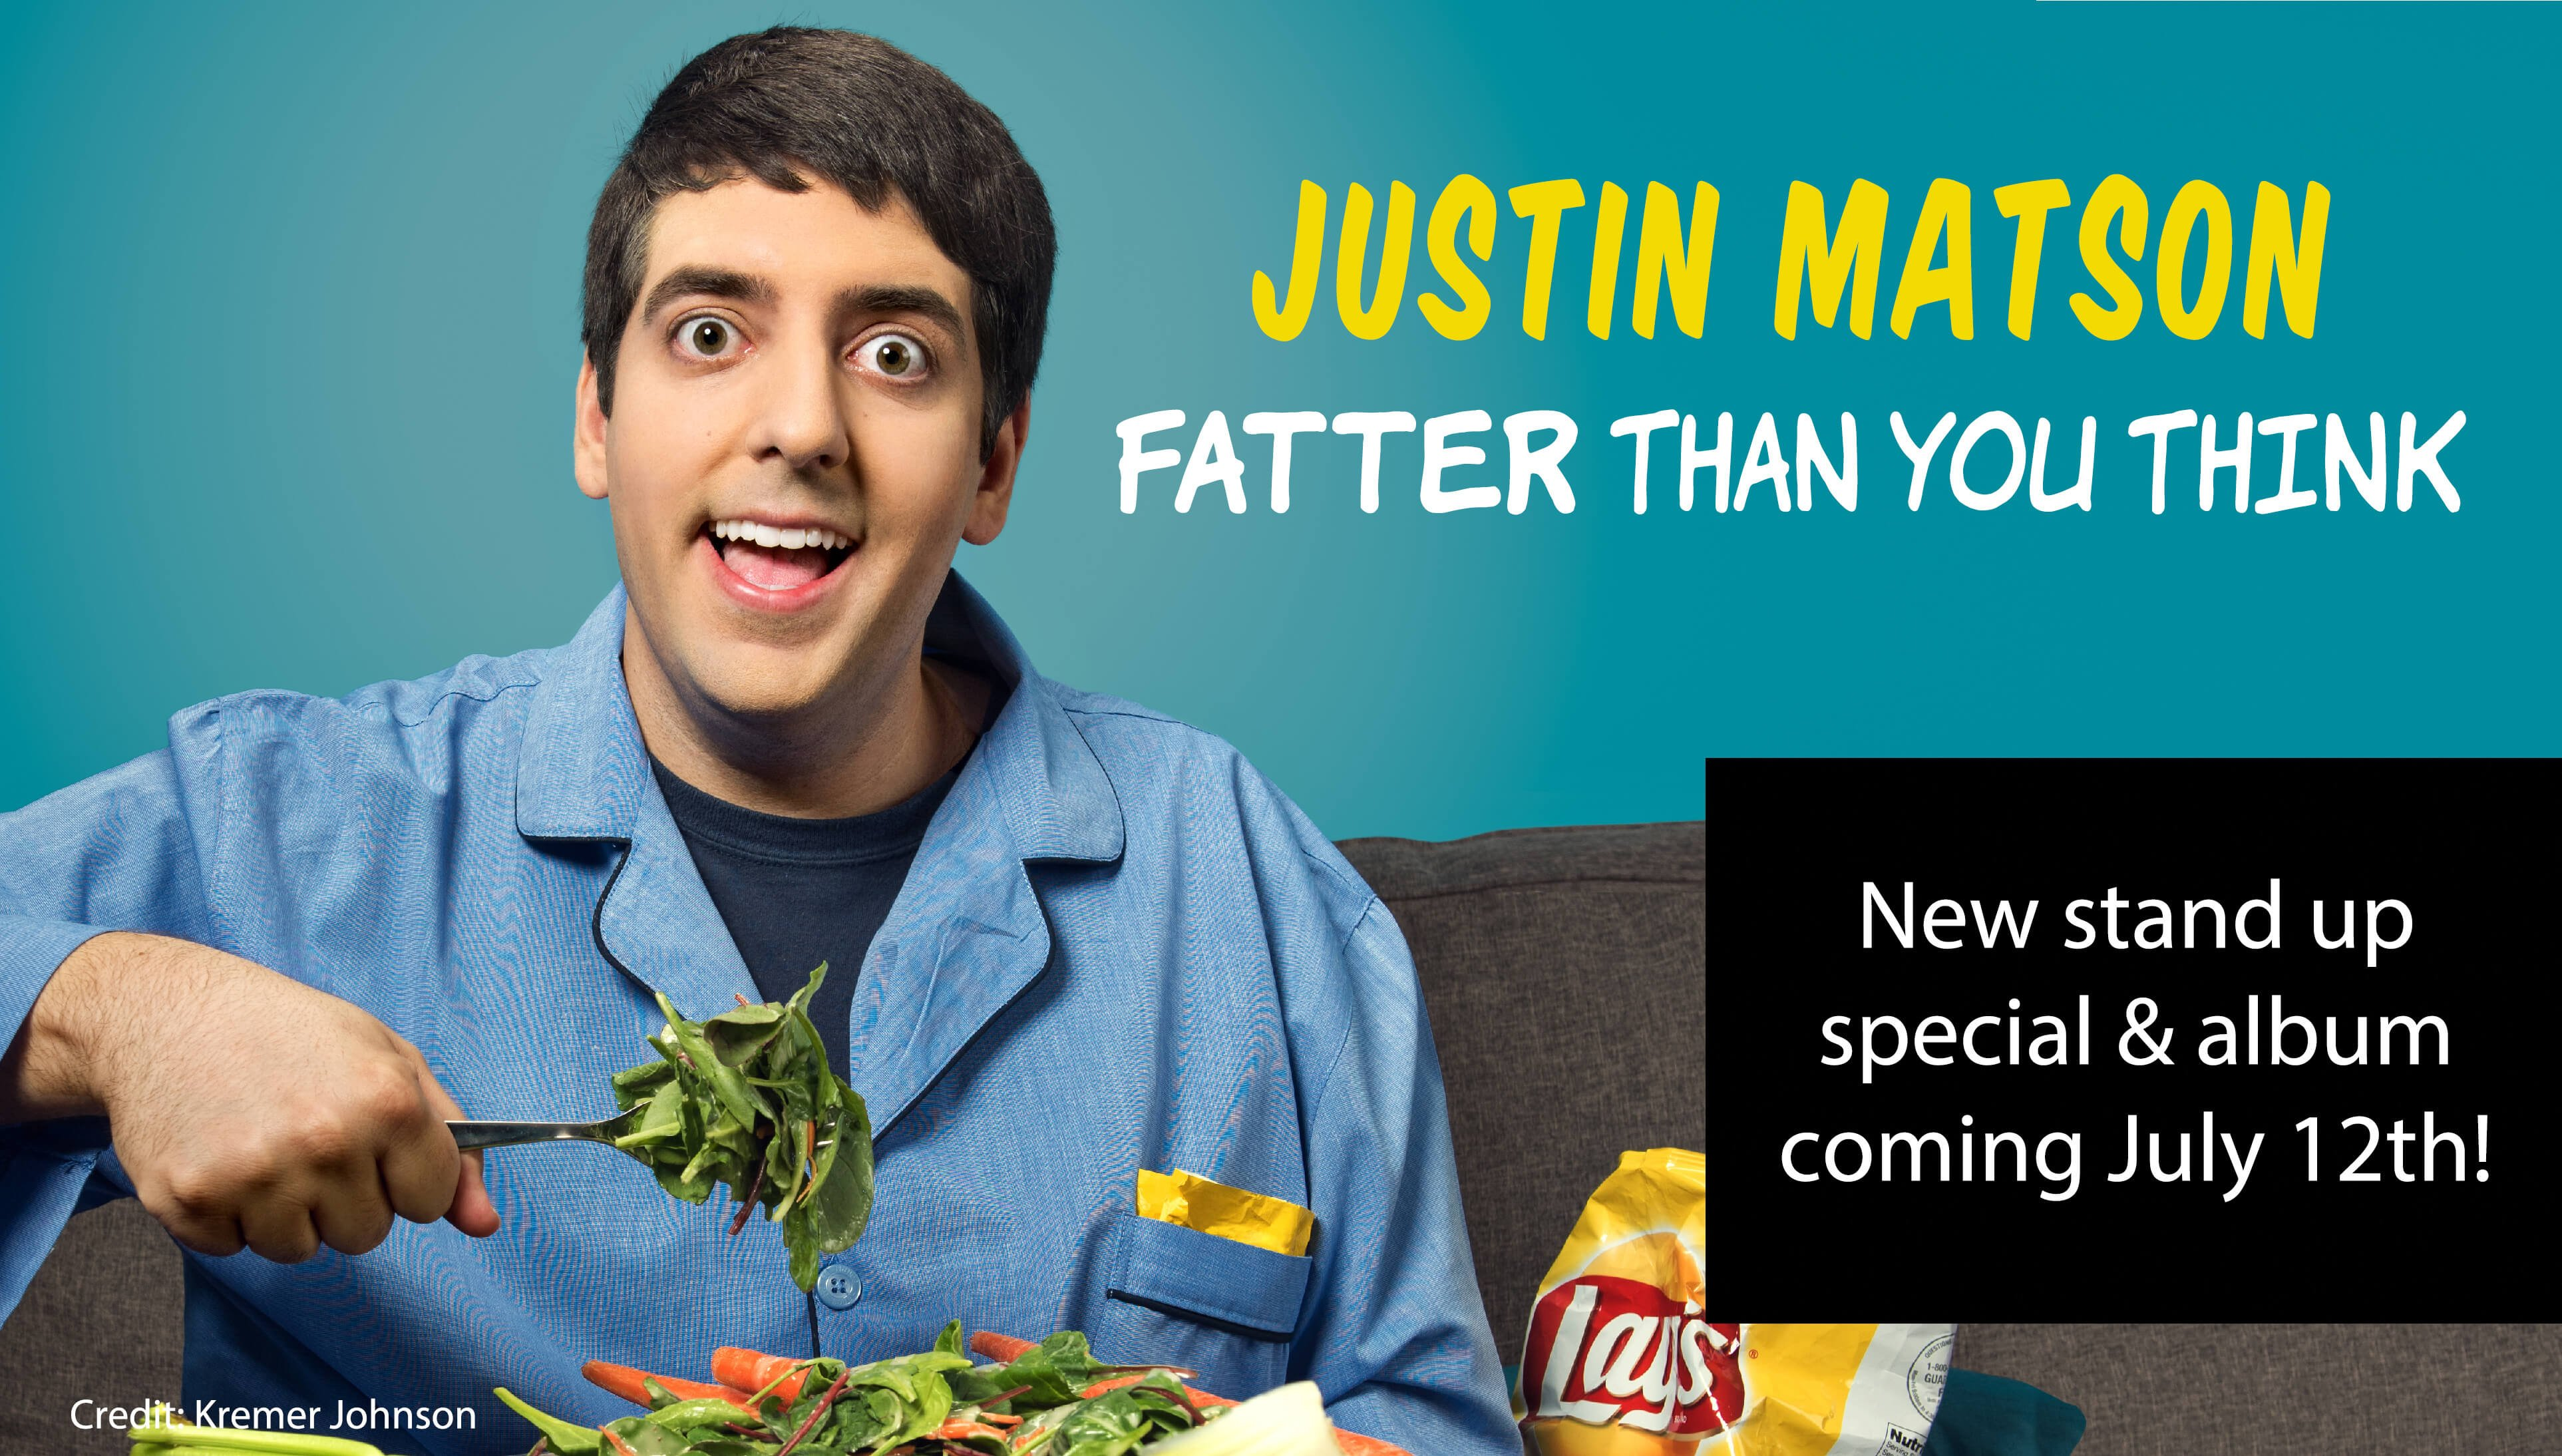 Justin Matson - Comedian - Writer - Poet - Filmmaker - Awesome - Follow on Twitter @justinmatson